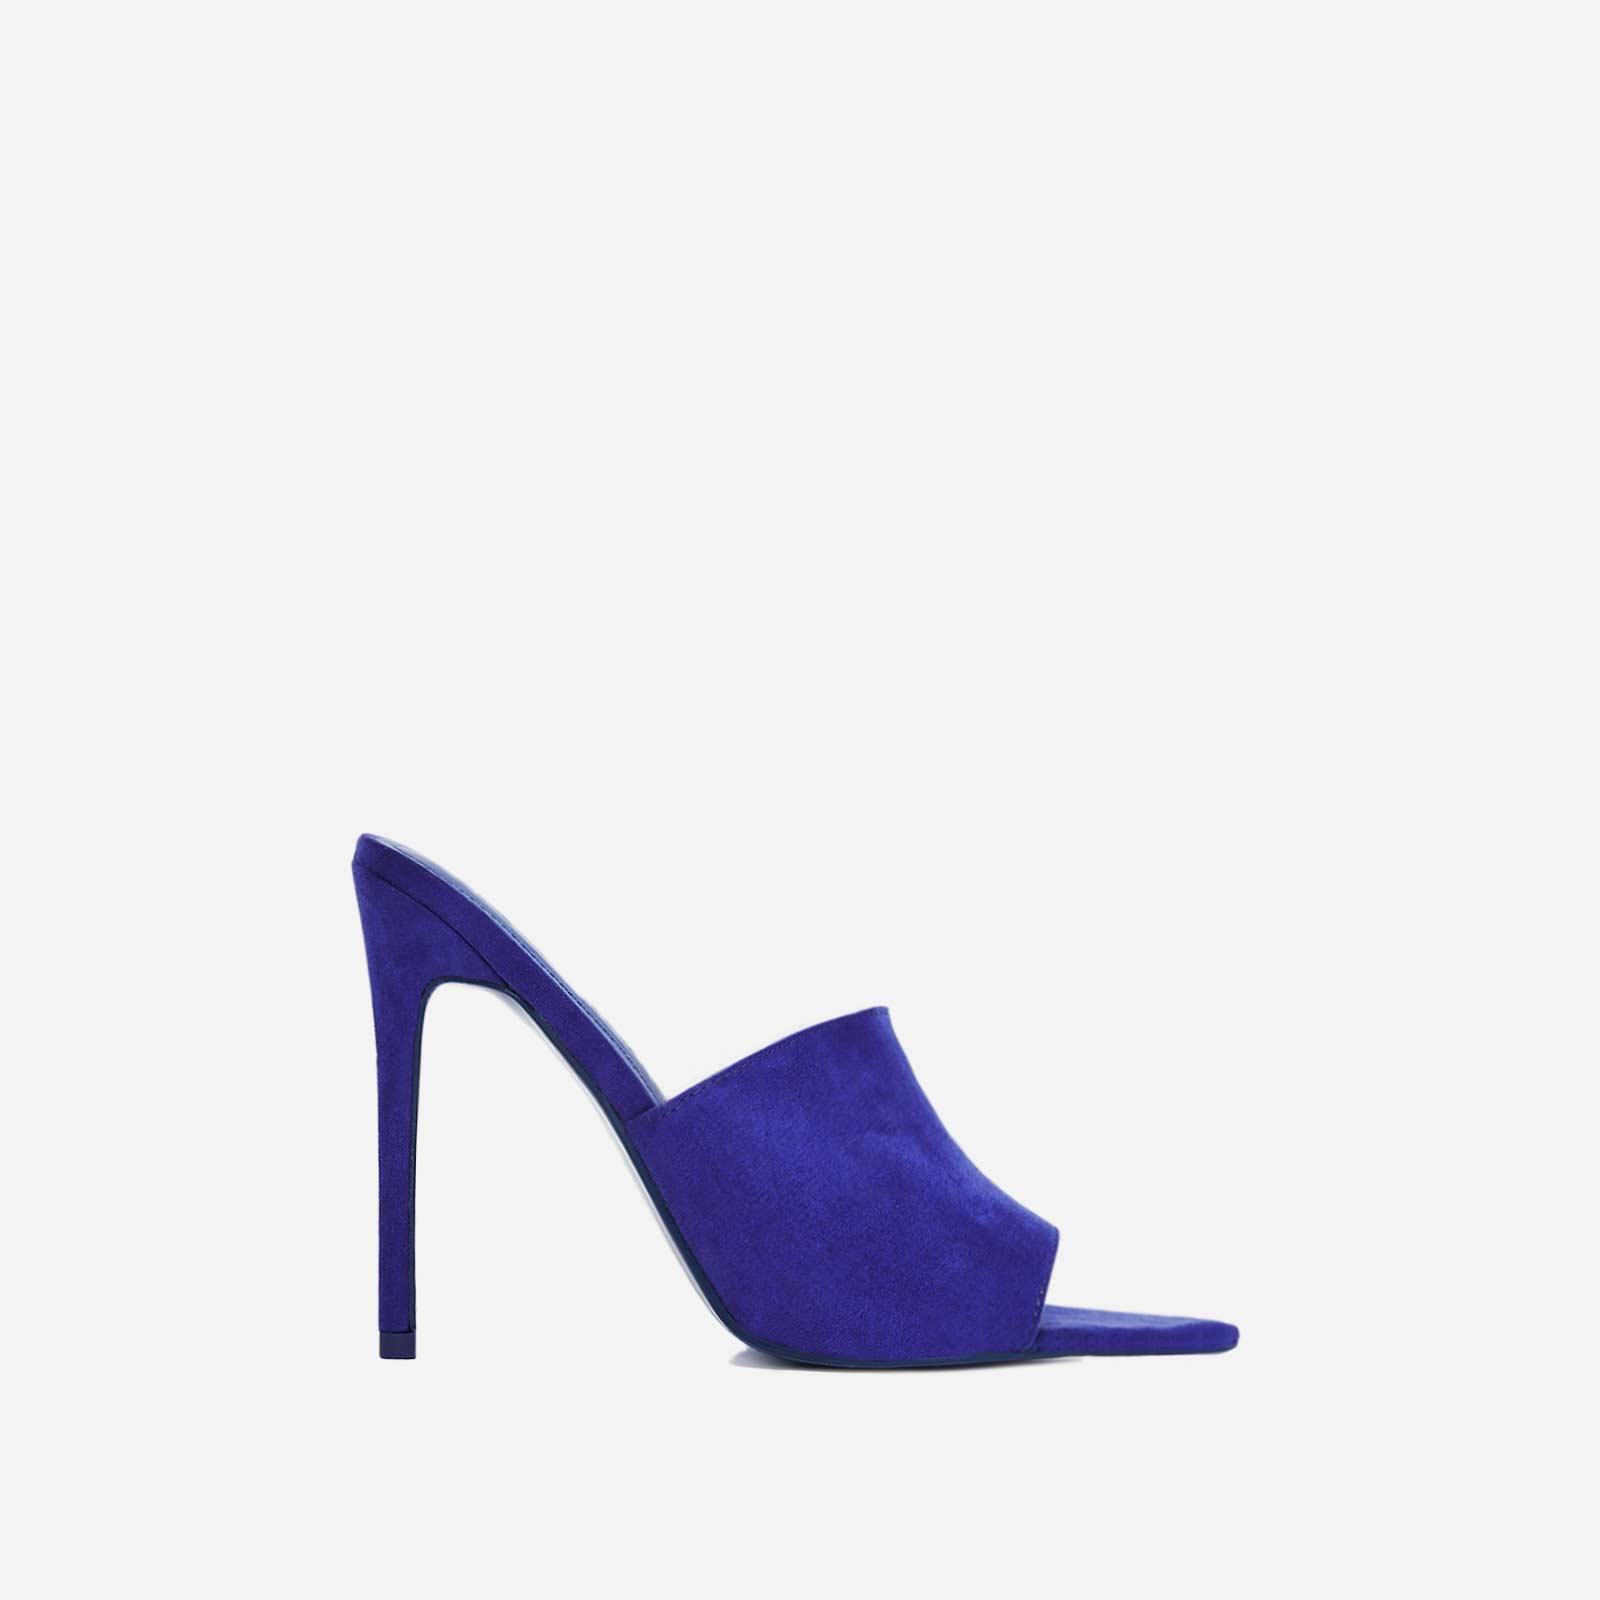 Cece Pointed Peep Toe Mule In Blue Faux Suede